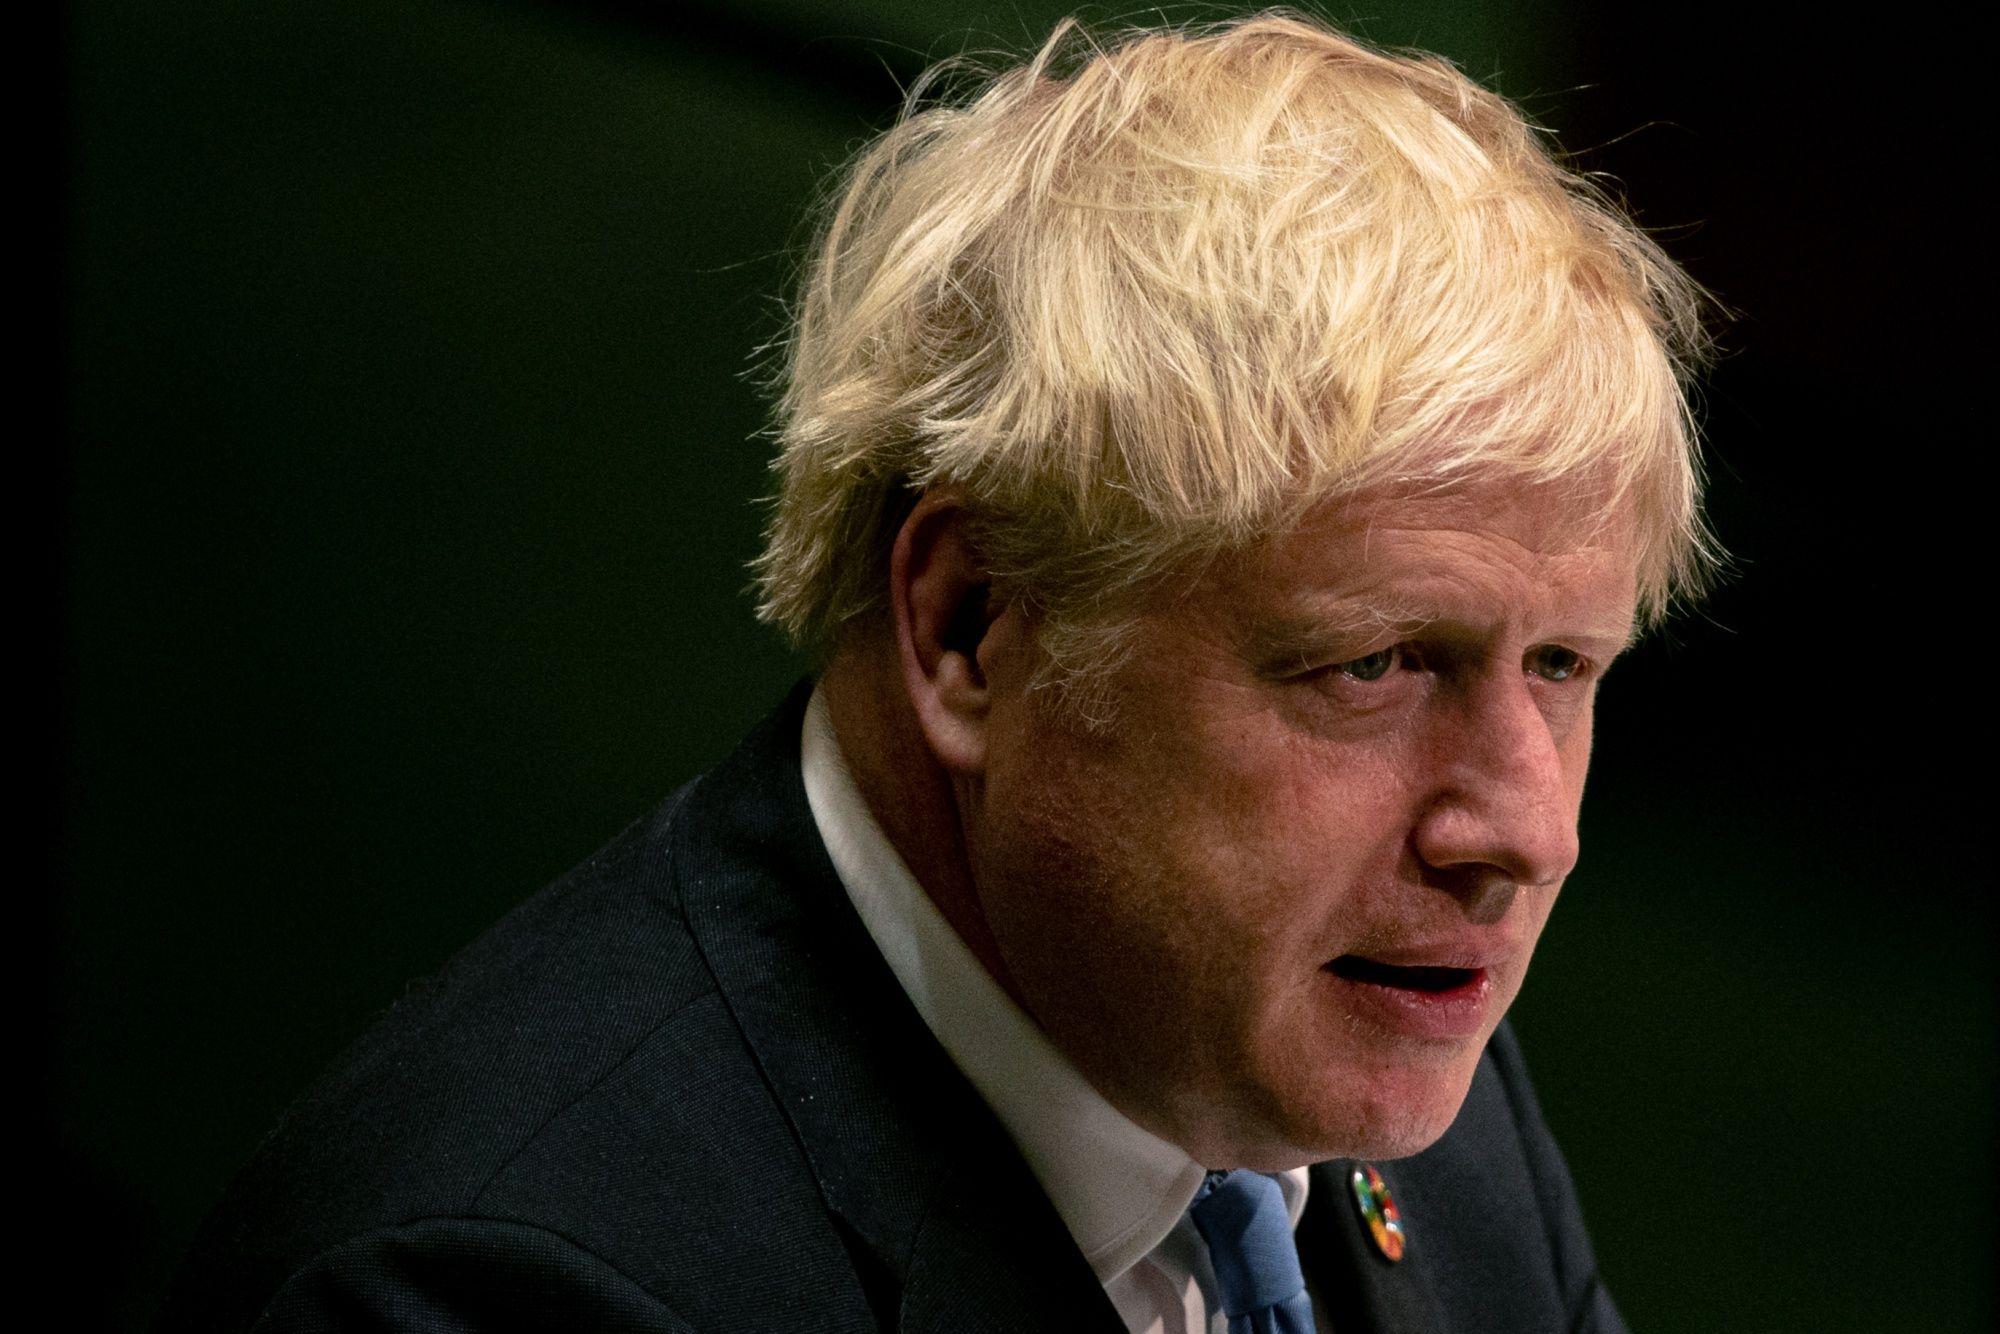 Sturgeon Urges Parliament to Remove Boris Johnson: Brexit Update